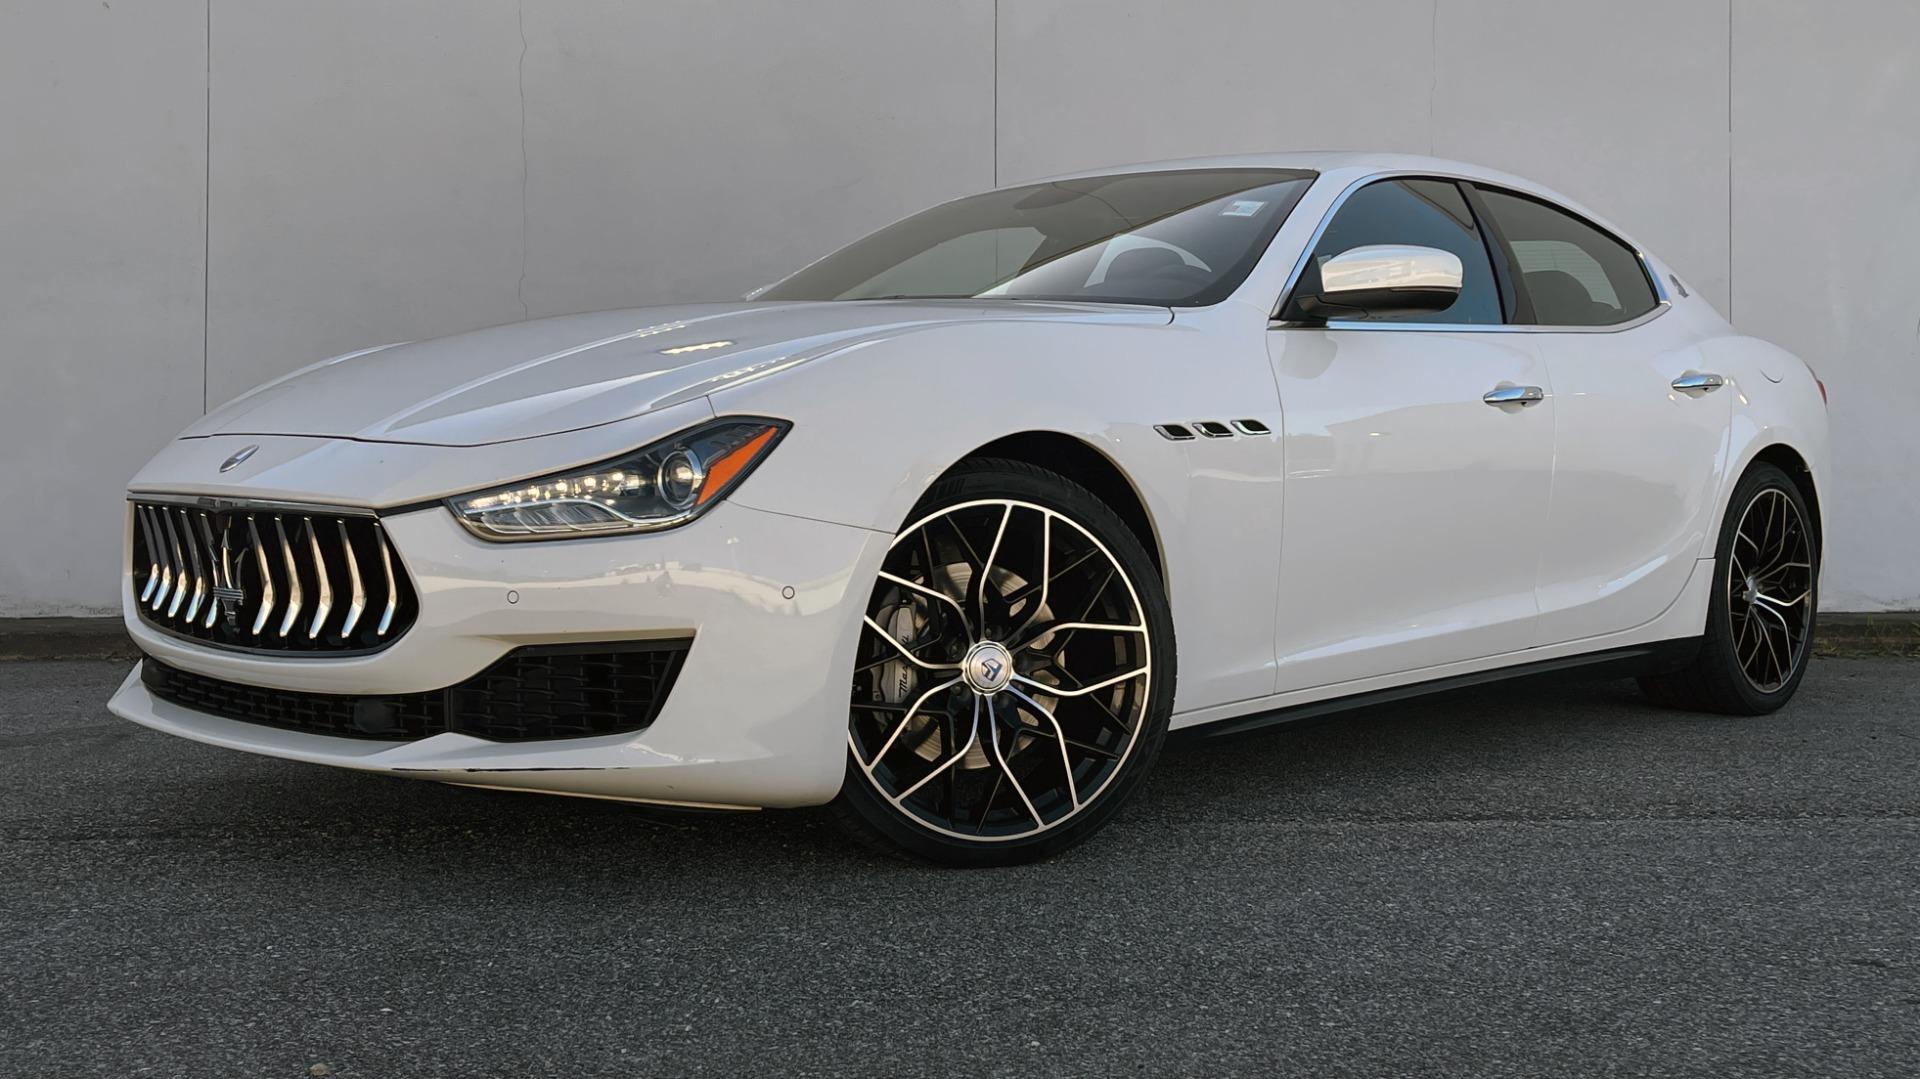 Used 2018 Maserati GHIBLI SEDAN / RWD / 3.0L V6 / SUNROOF / NAV / REARVIEW for sale $42,995 at Formula Imports in Charlotte NC 28227 1